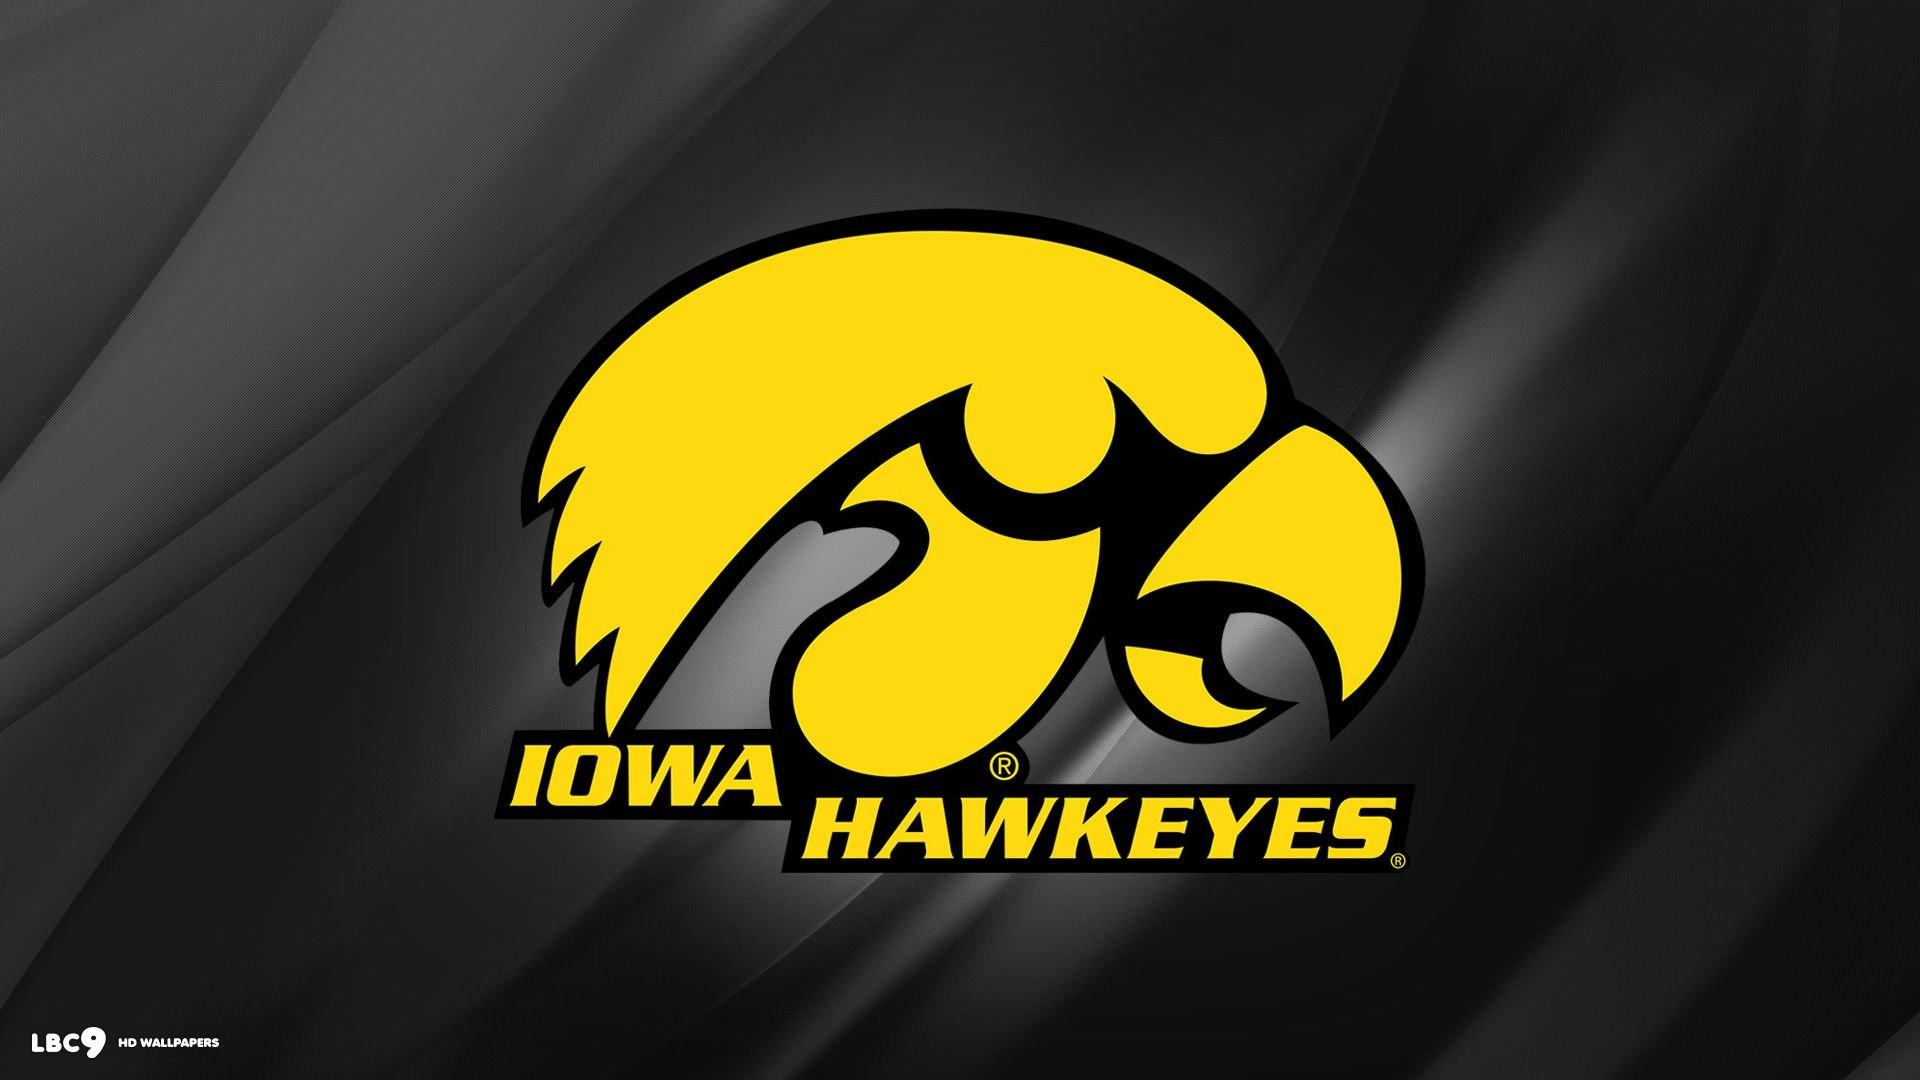 Iowa Hawkeye Wallpaper for iPad 77 images 1920x1080